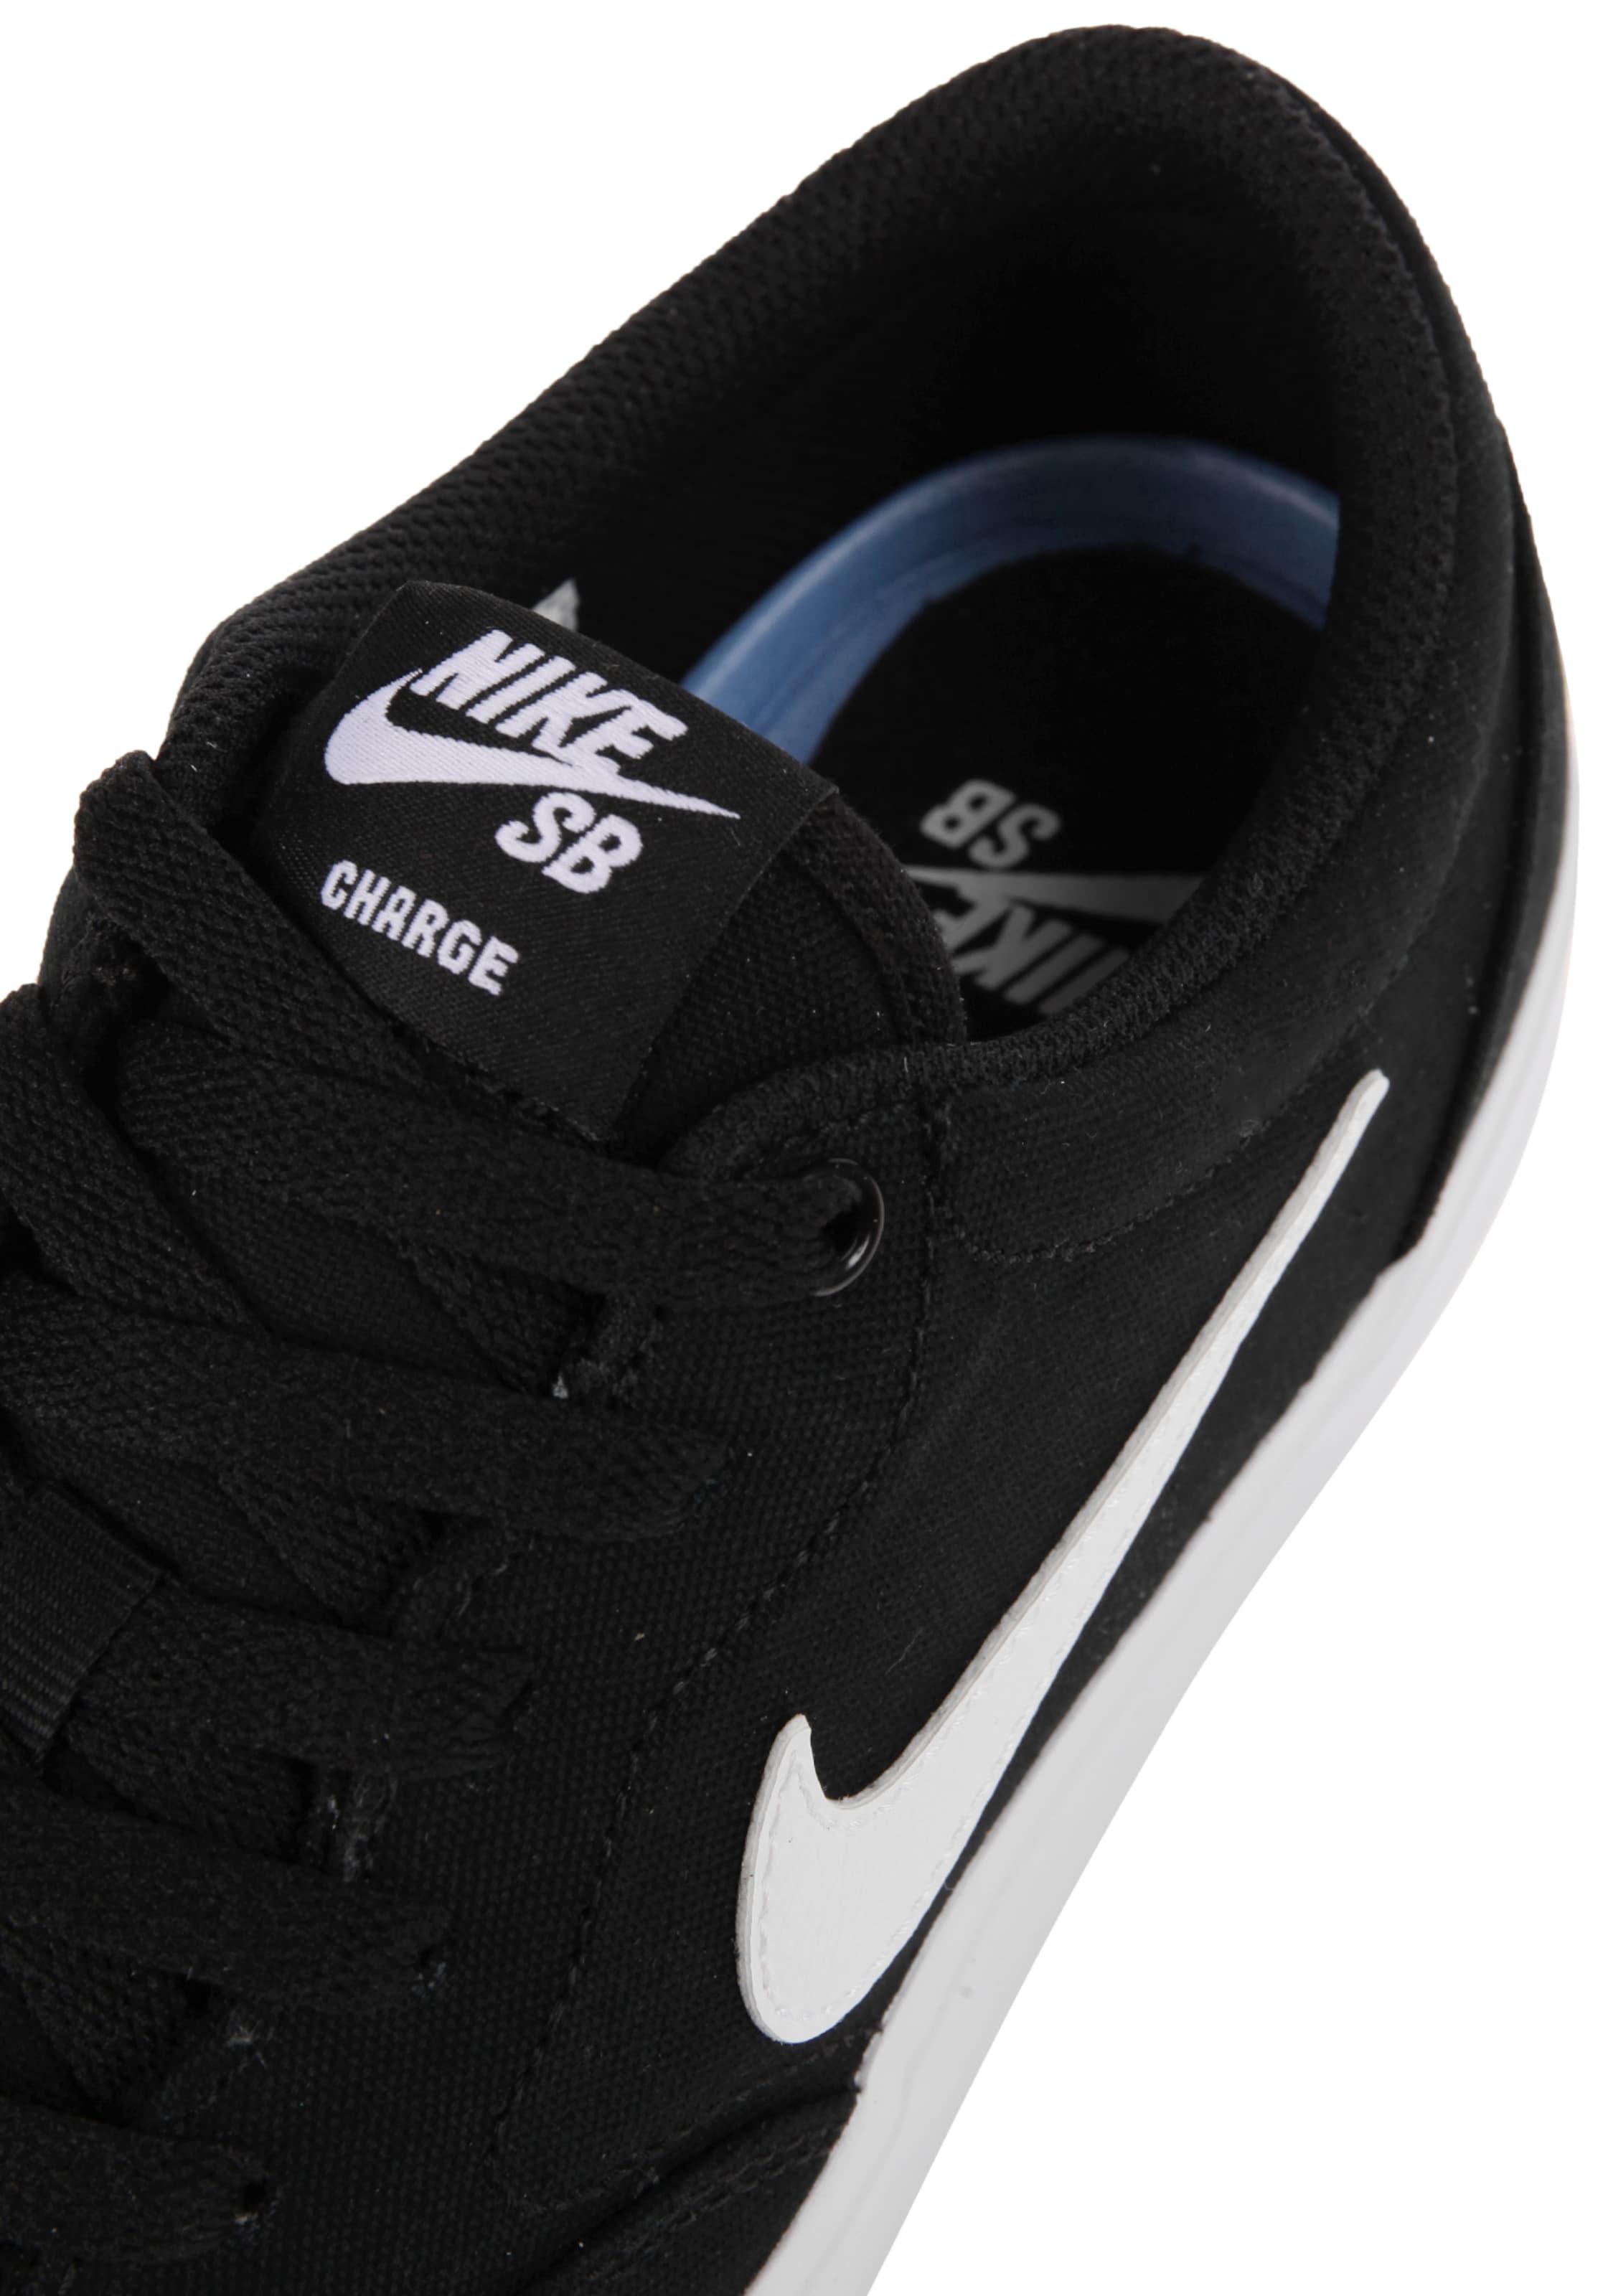 Nike SB SB SB Turnschuhe 'Charge Textil Lässig wild 75bf94